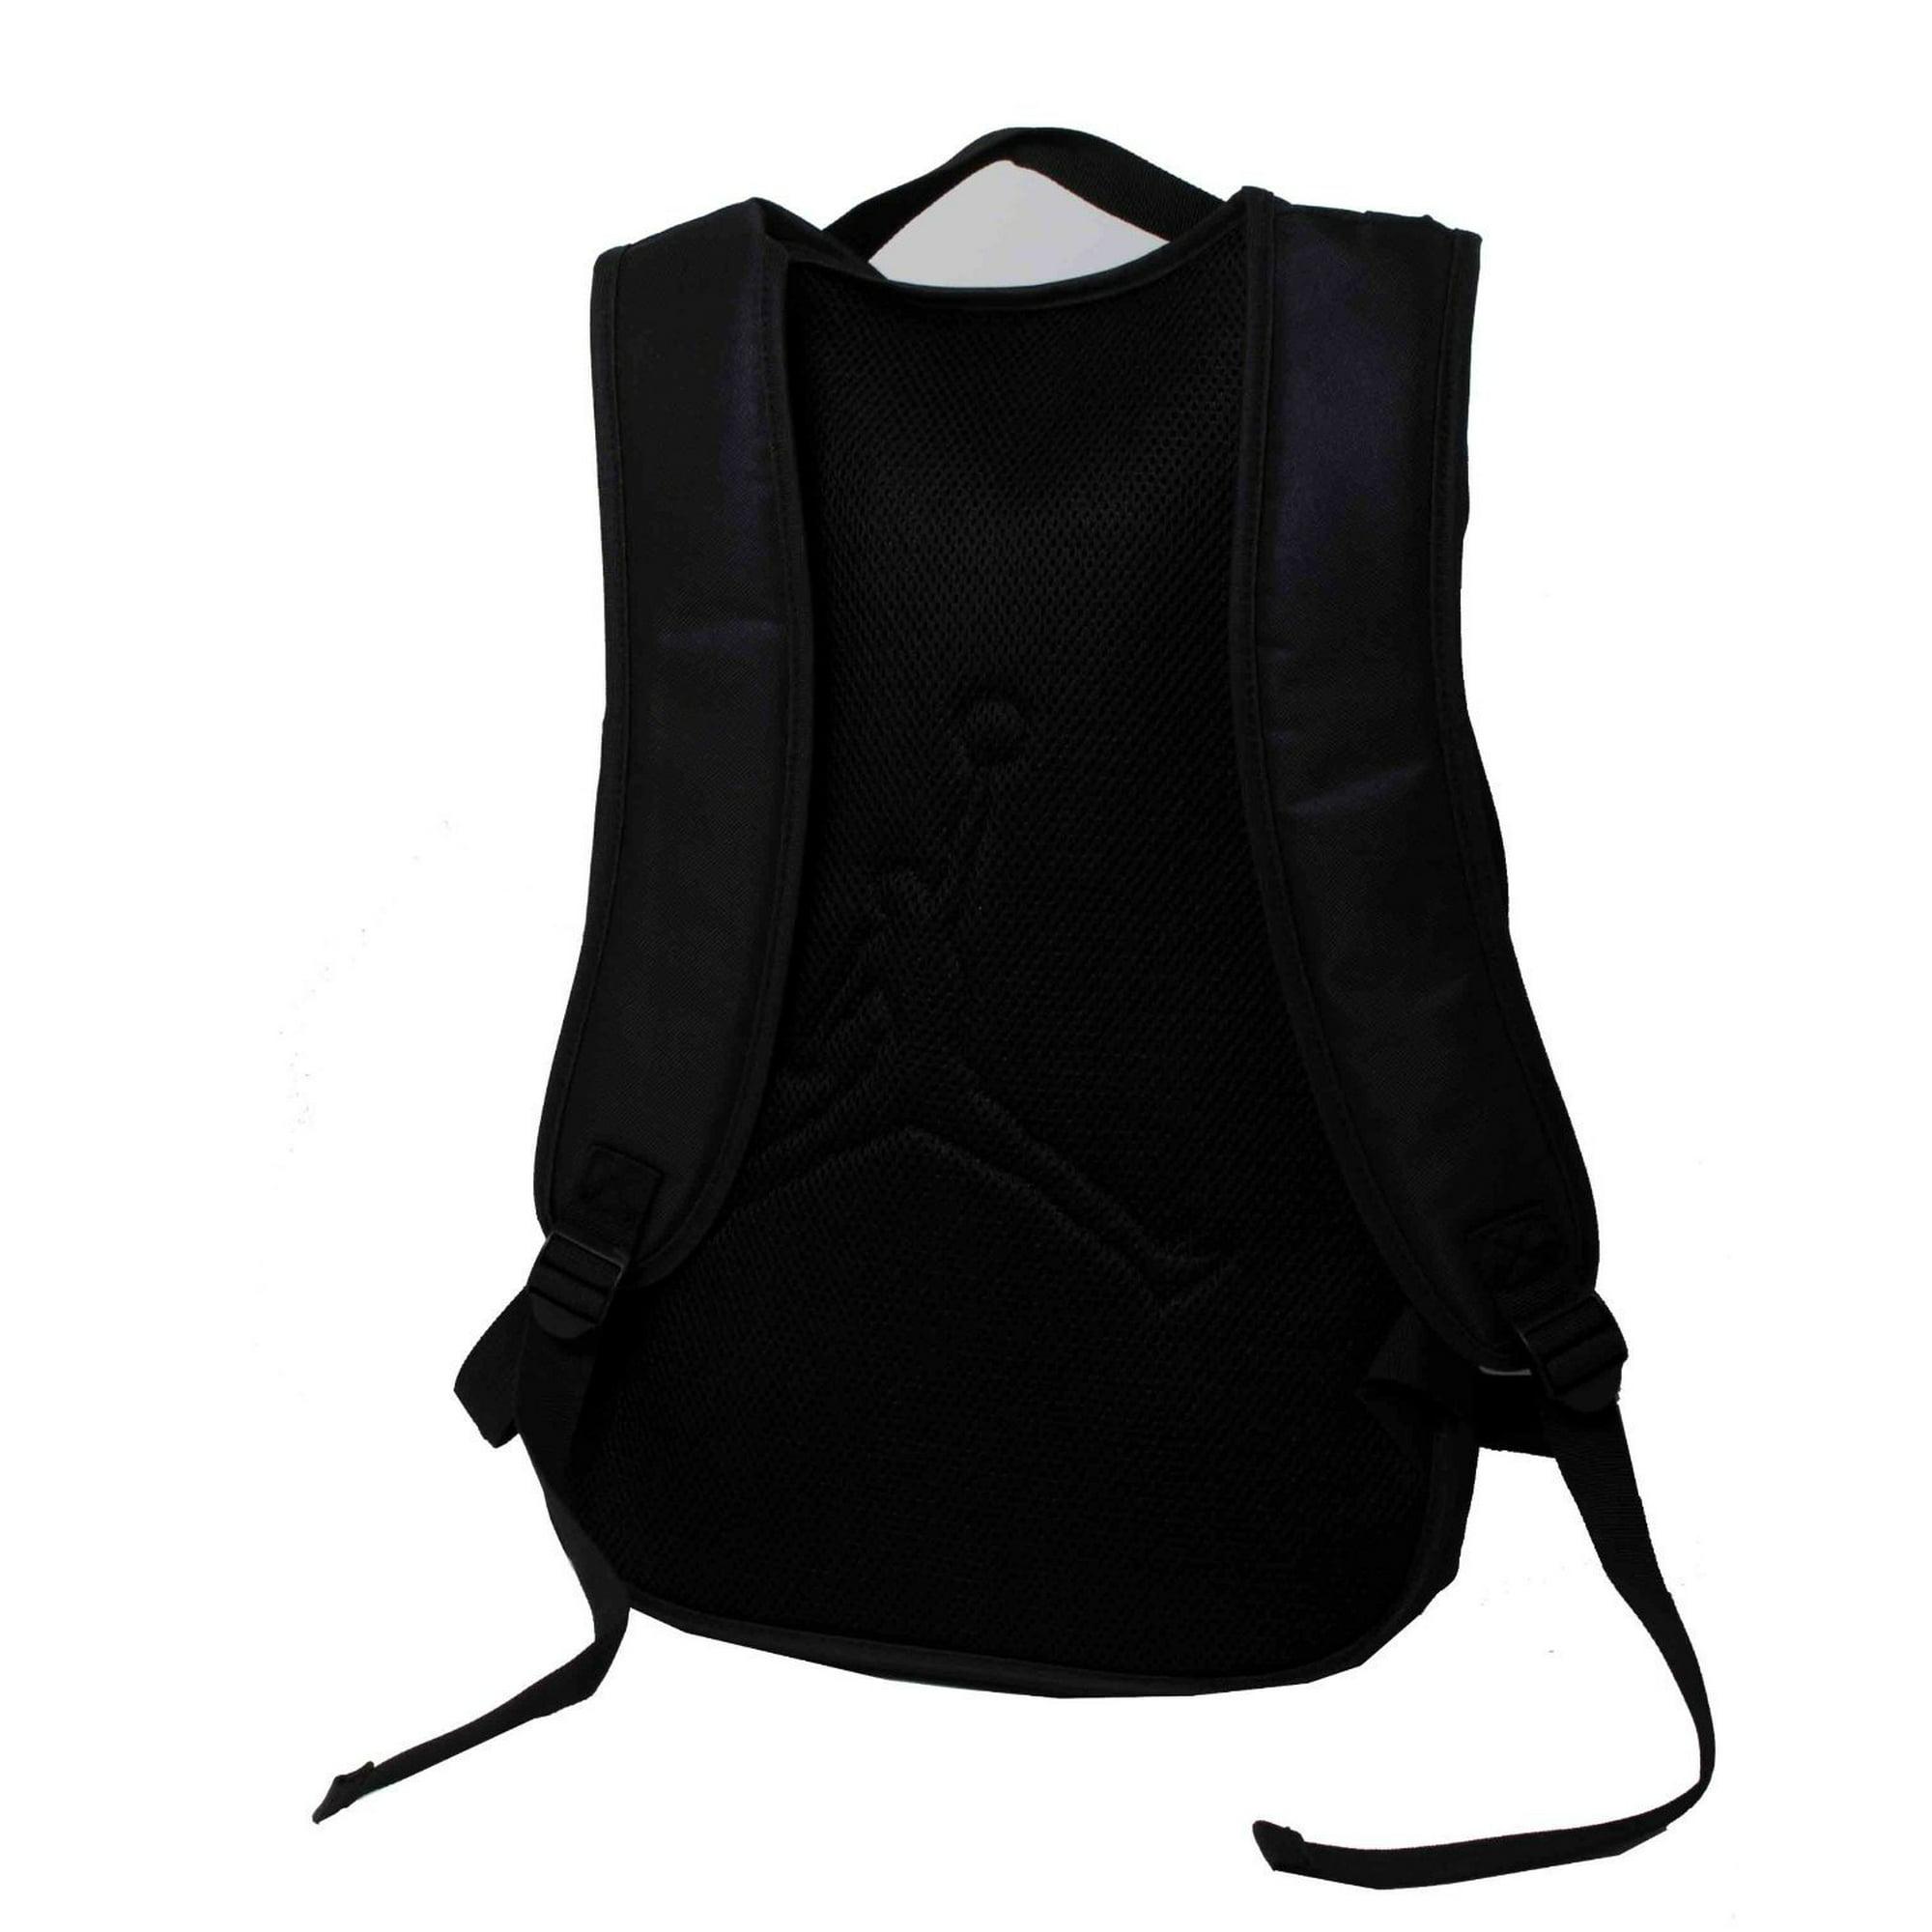 Buy Nike Jordan Air Jumpman Backpack Book Bag-Black-Green  9e0d60a878b76